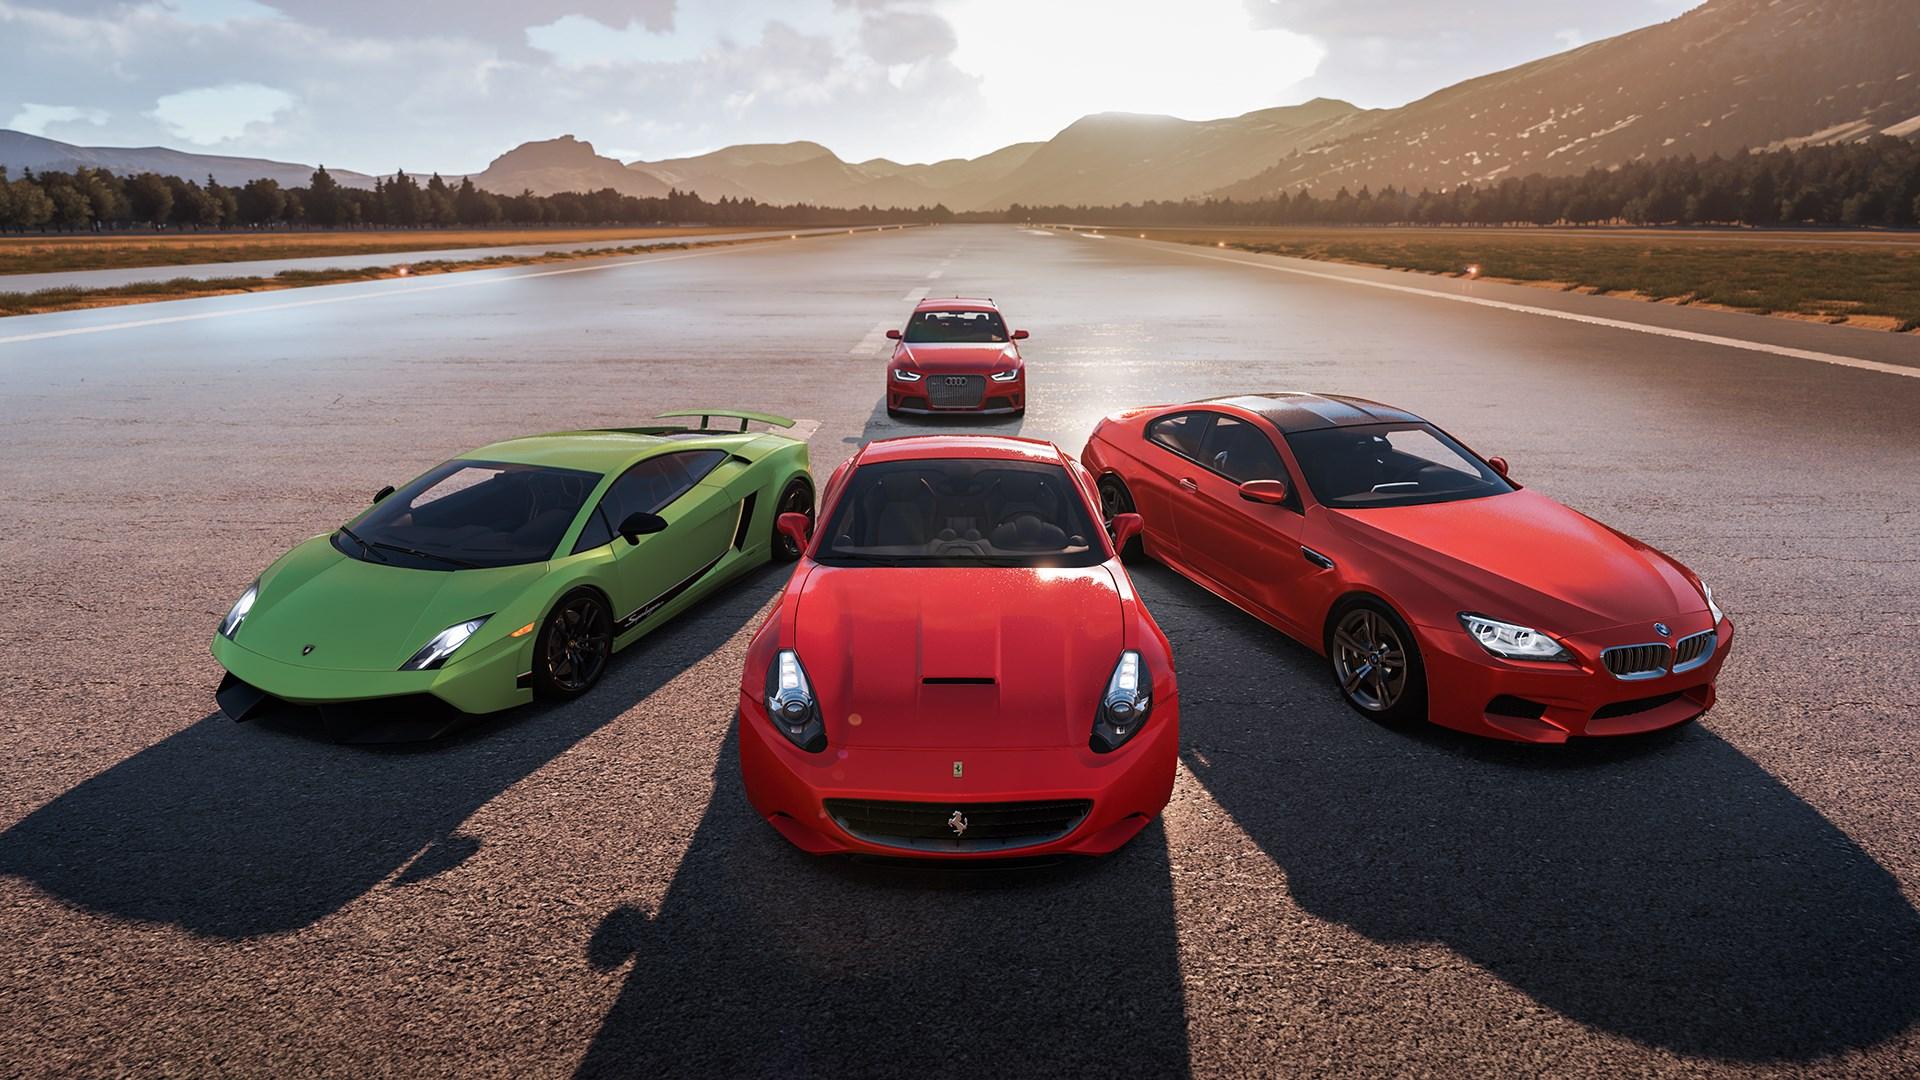 Forza Horizon 2 Pre-Order Car Pack